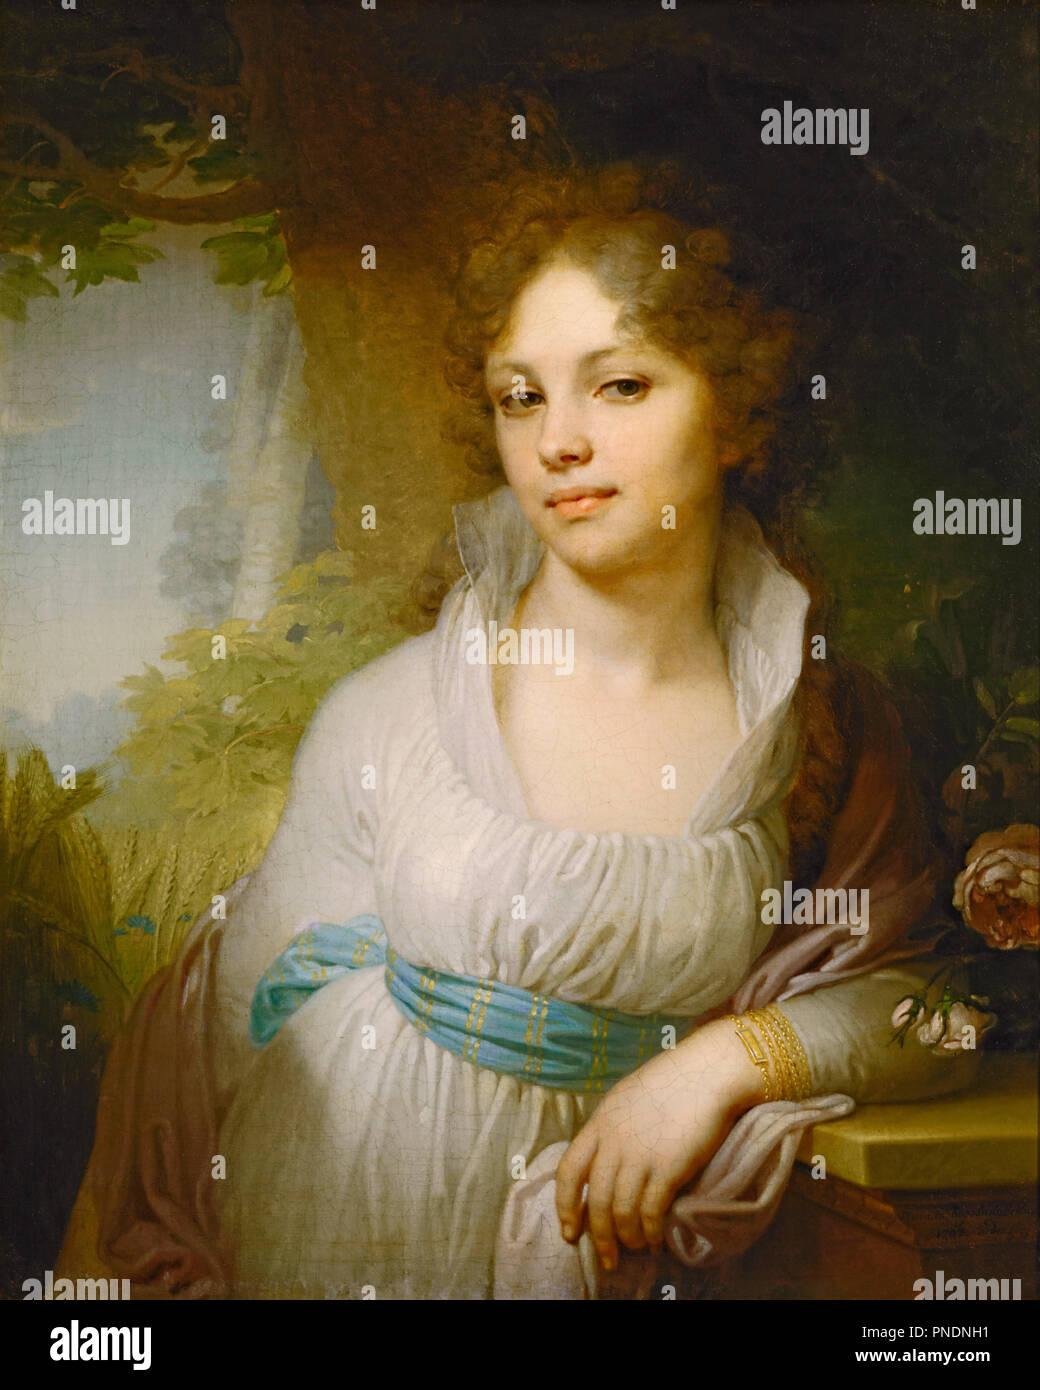 Portrait of M.I.Lopukhina. Date/Period: 1797. Painting. Oil on canvas. Height: 72 cm (28.3 in); Width: 53.5 cm (21 in). Author: Vladimir Borovikovsky. Borovikovsky, Vladimir Lukich. - Stock Image